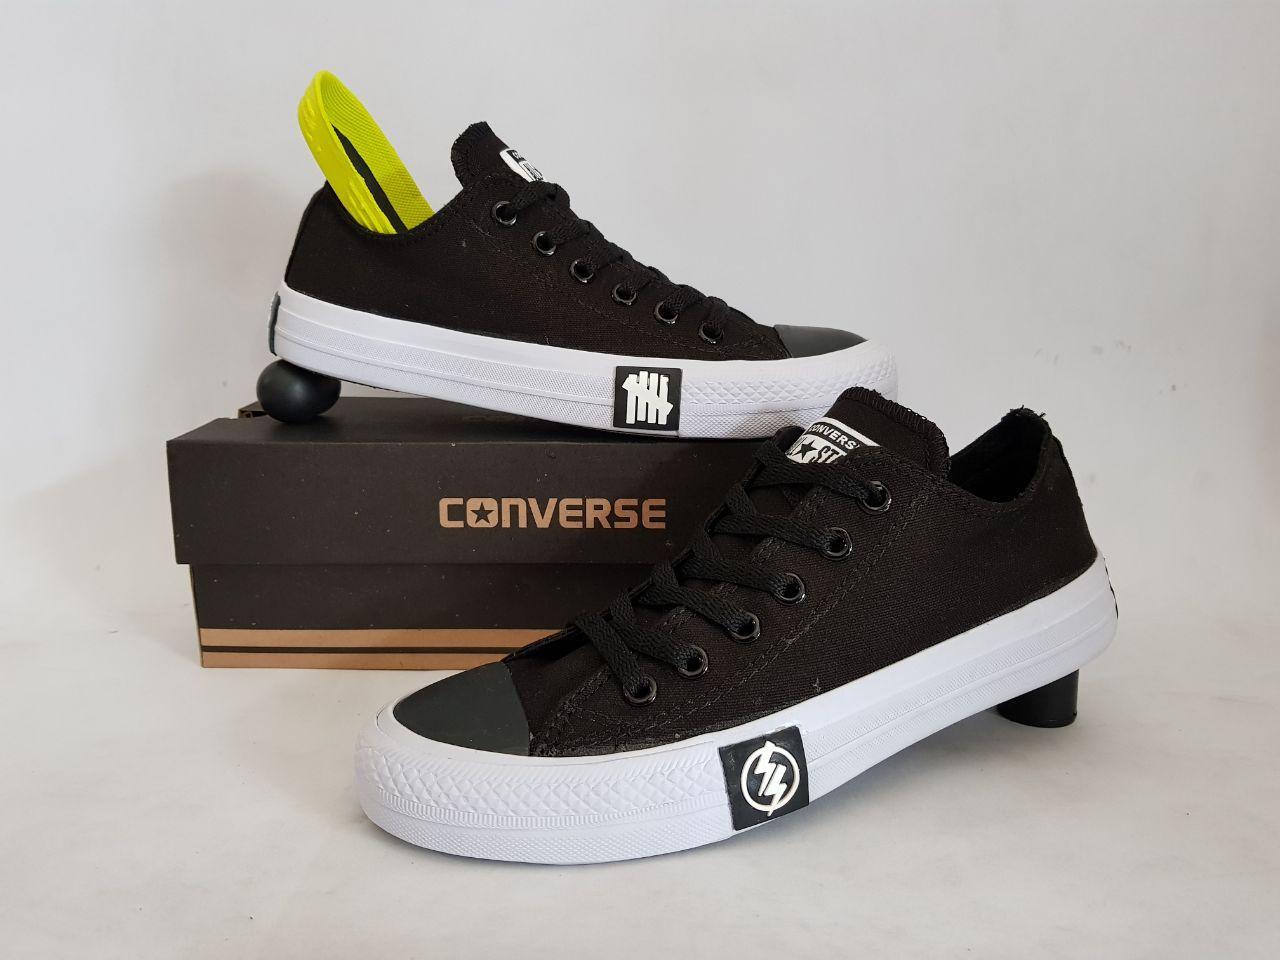 Promo Spesial Converse Pro Leather Mid Black Di Online Shop Diskon Sepatu Chuck Taylor 2 Original Vietnam Sneakers Tailor Dragon Kets Allstar Petir